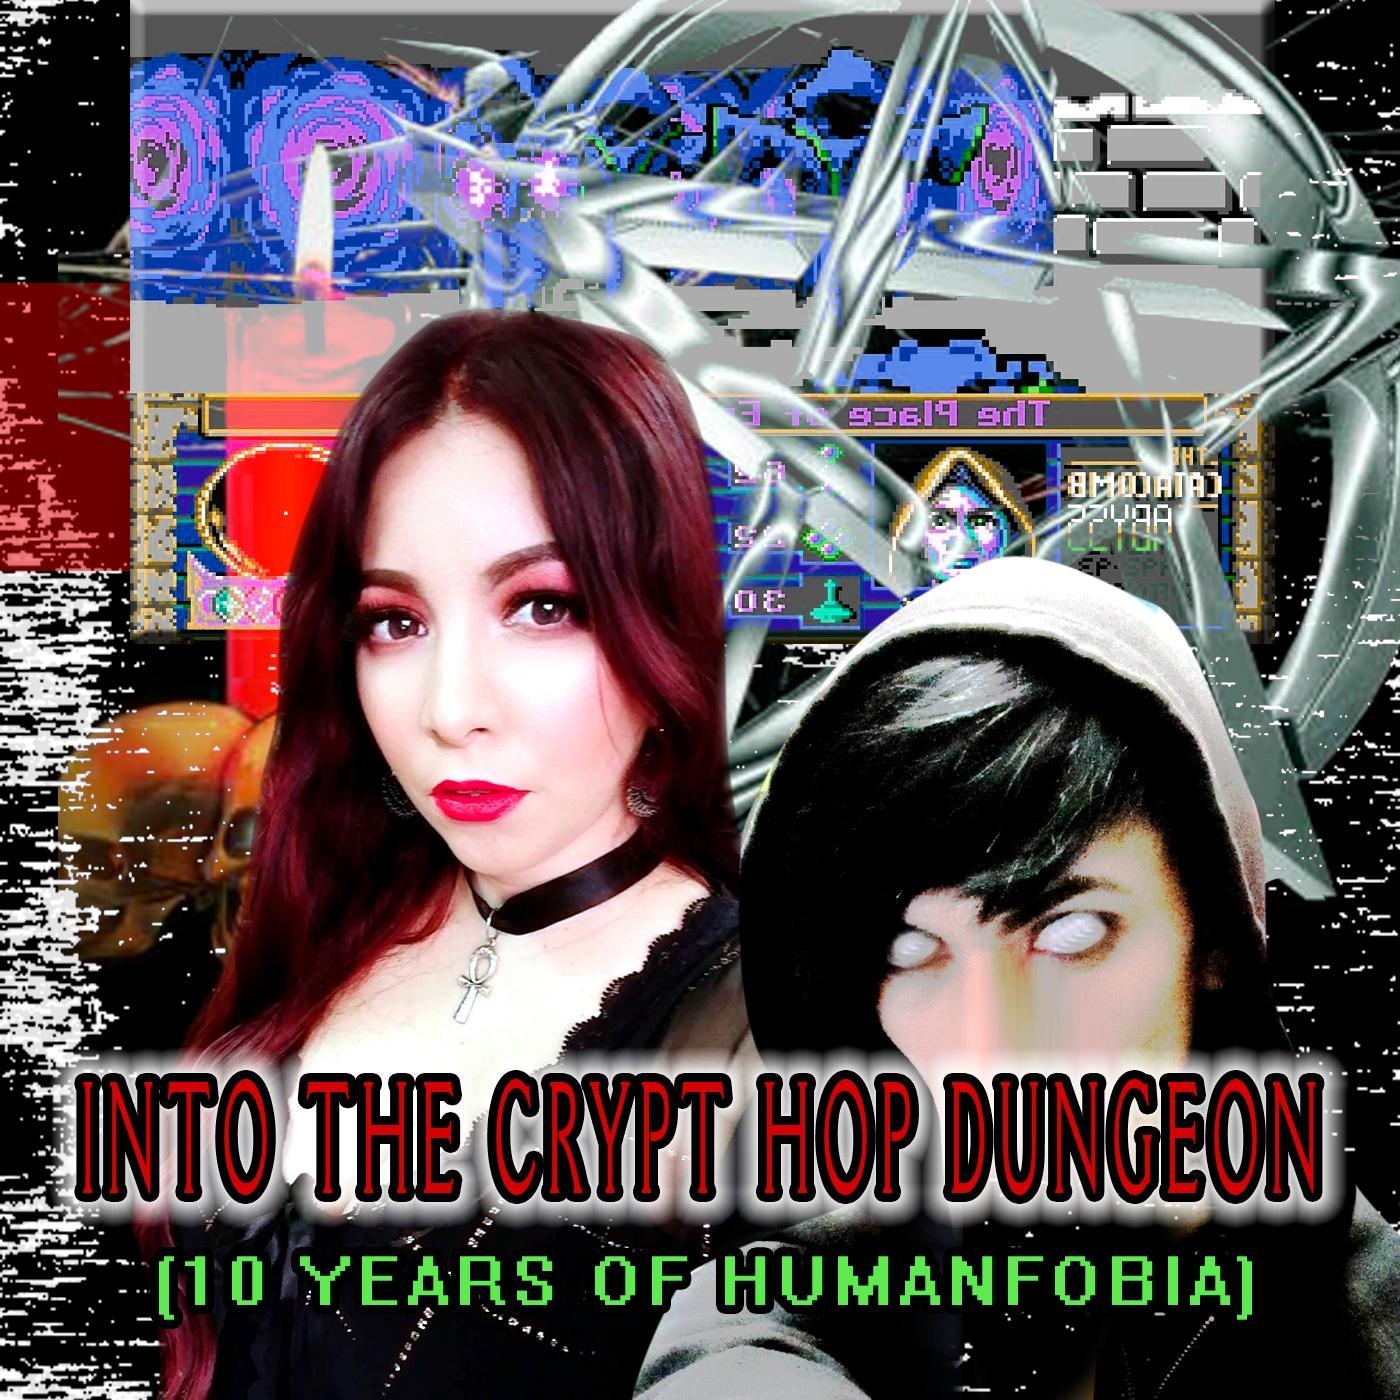 Humanfobia - Crypt Hop Dungeon  - mistspectra   ello